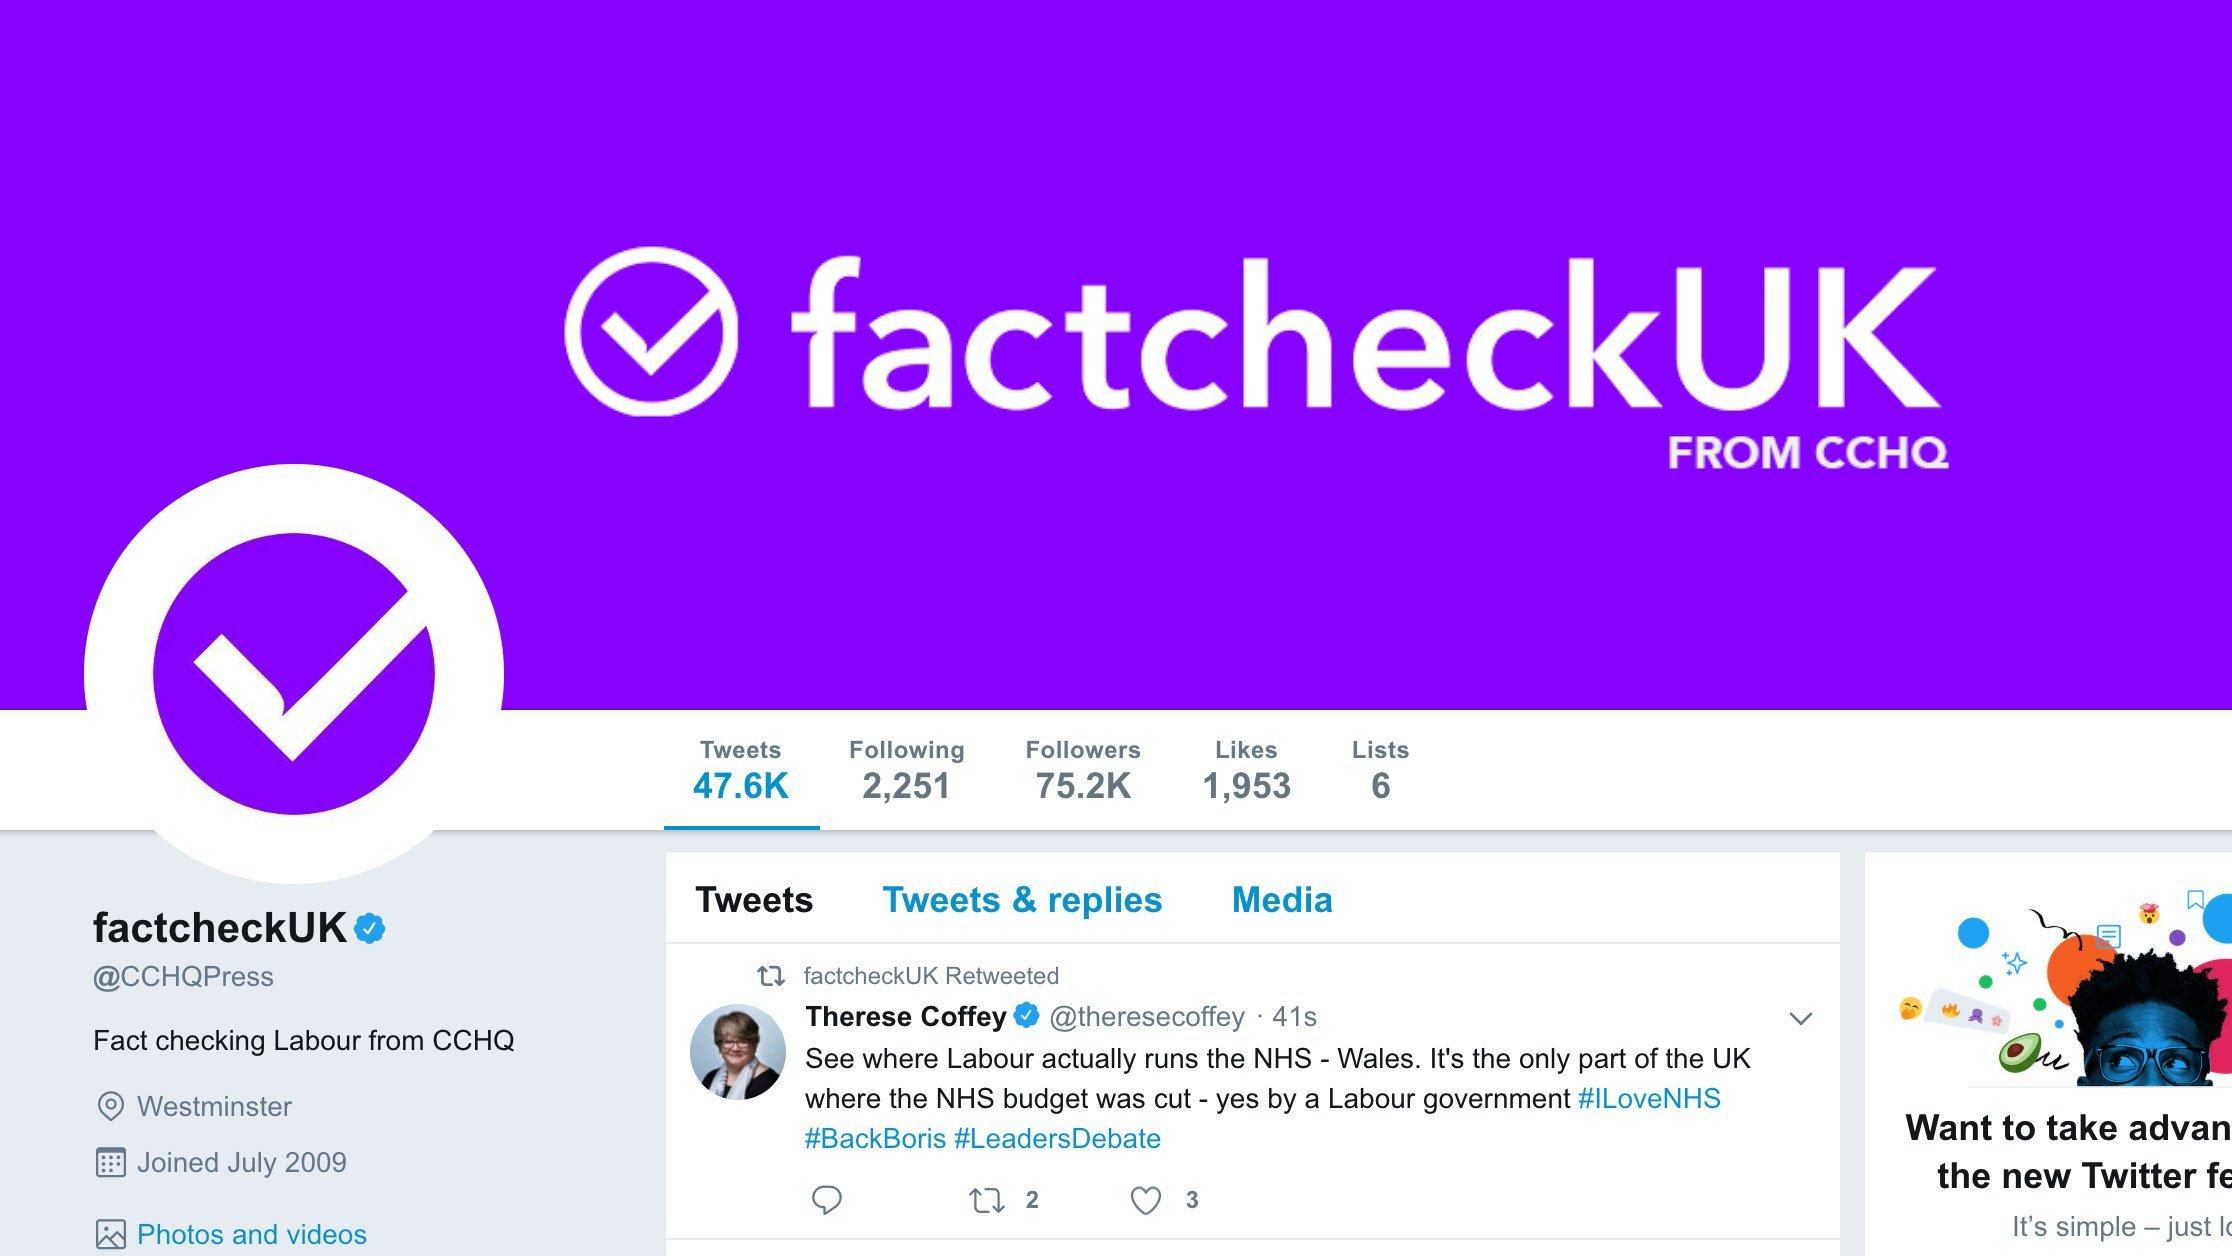 UK Conservatives criticized for 'misleading' Twitter change